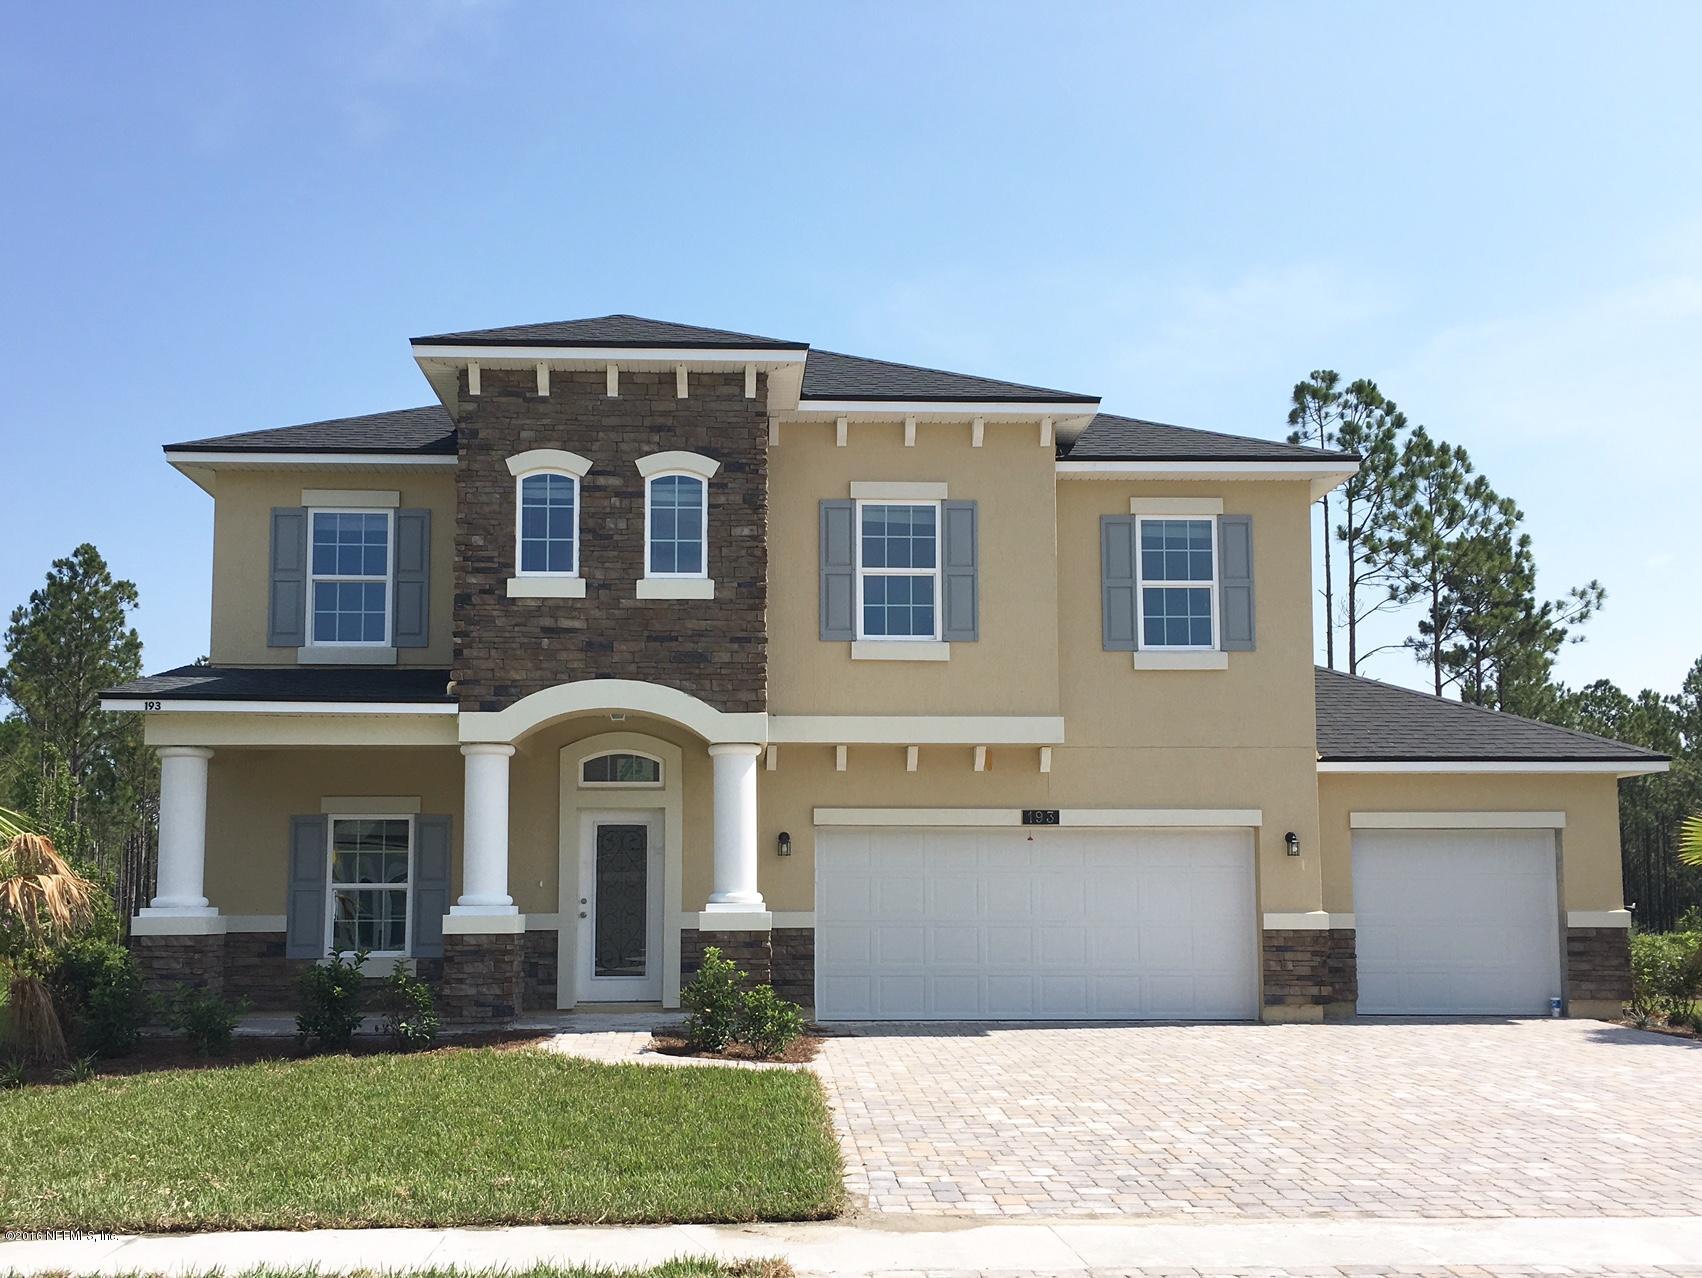 193 BALVENIE,ST JOHNS,FLORIDA 32259,5 Bedrooms Bedrooms,3 BathroomsBathrooms,Residential - single family,BALVENIE,805999